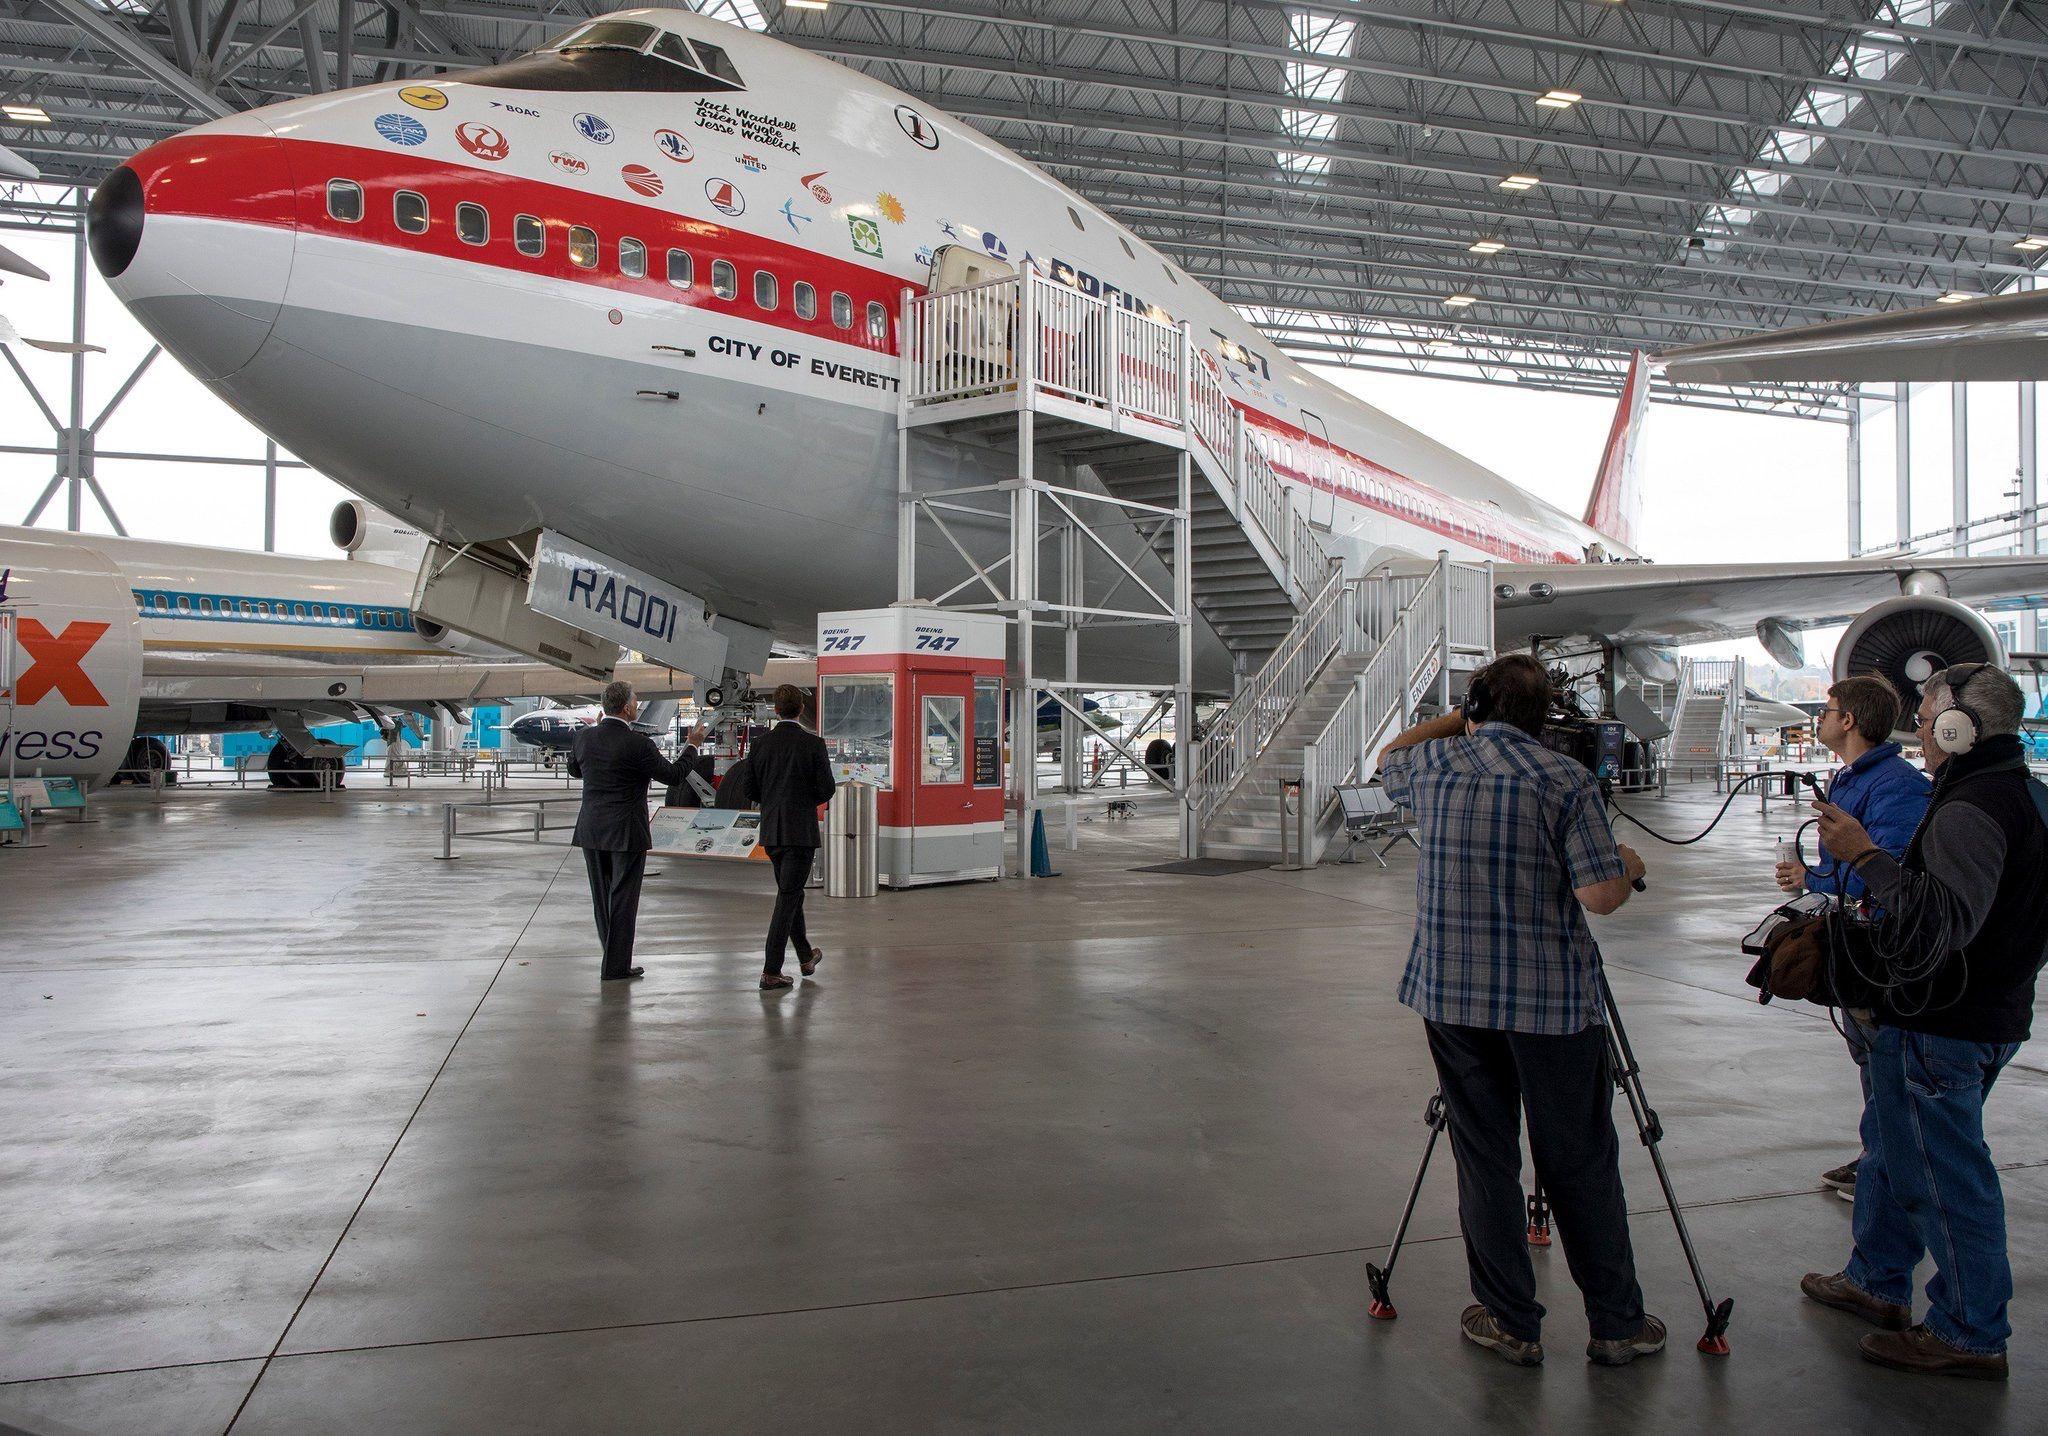 Boeing 747 prototype], Seattle's Museum of Flight | Boeing aircraft, Boeing  747, Boeing